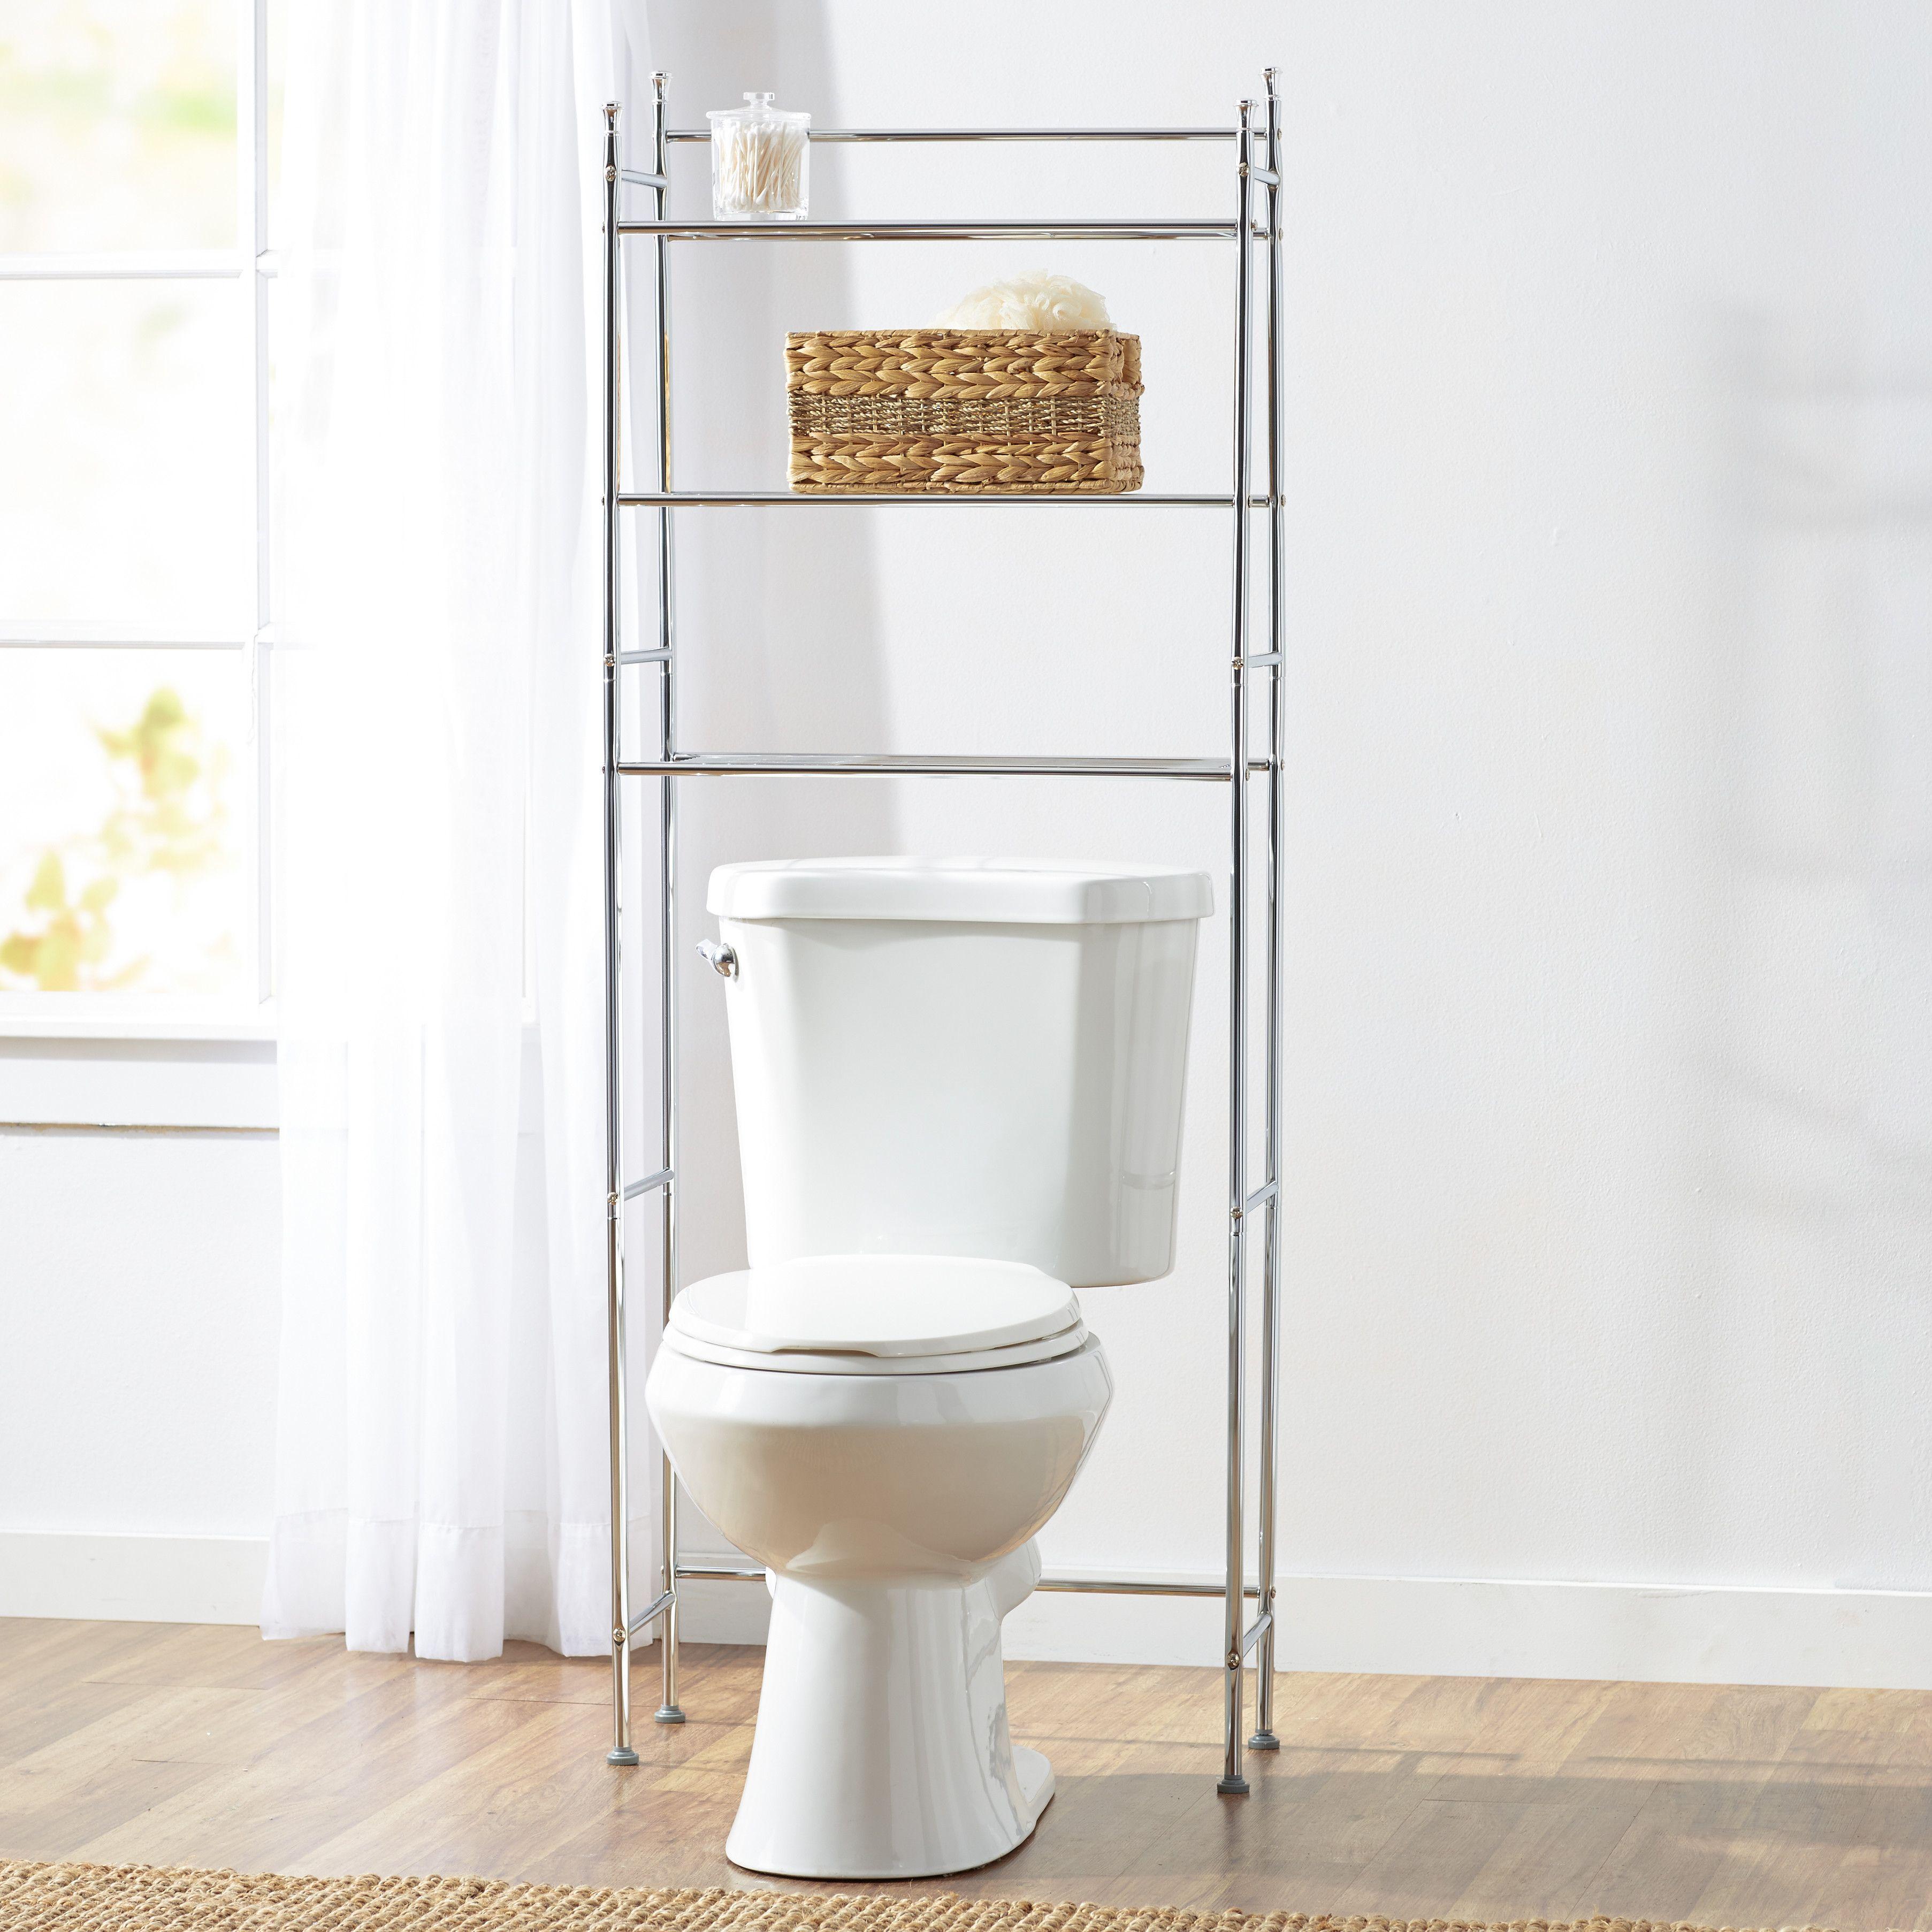 Wayfair Basics Wayfair Basics Over The Toilet Storage Toilet Storage Small Bathroom Storage Bathroom Shelf Decor